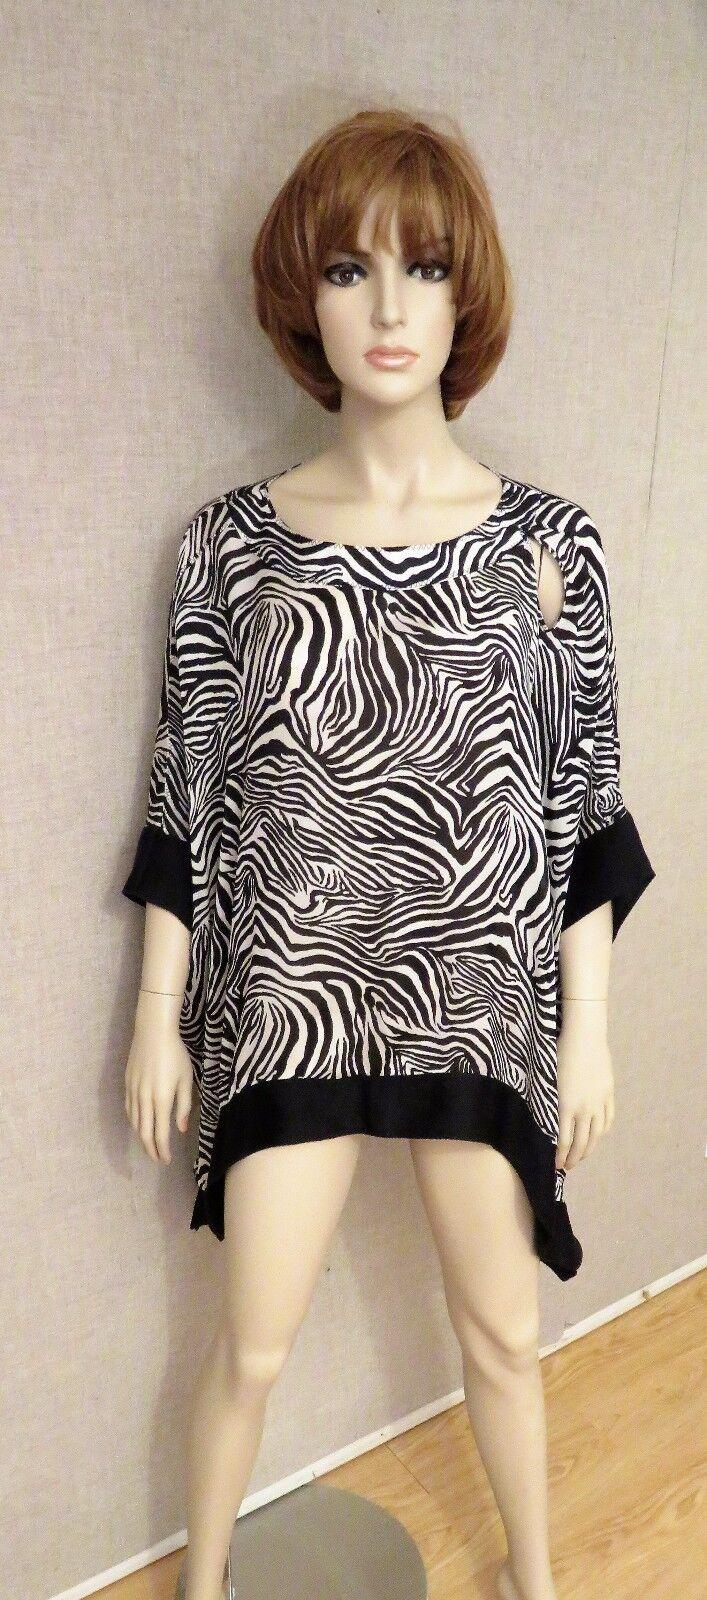 ST JOHN SPORT  495 Silk Poncho Kimono Top Tunic Duster Scarf Shirt new nwt zebra